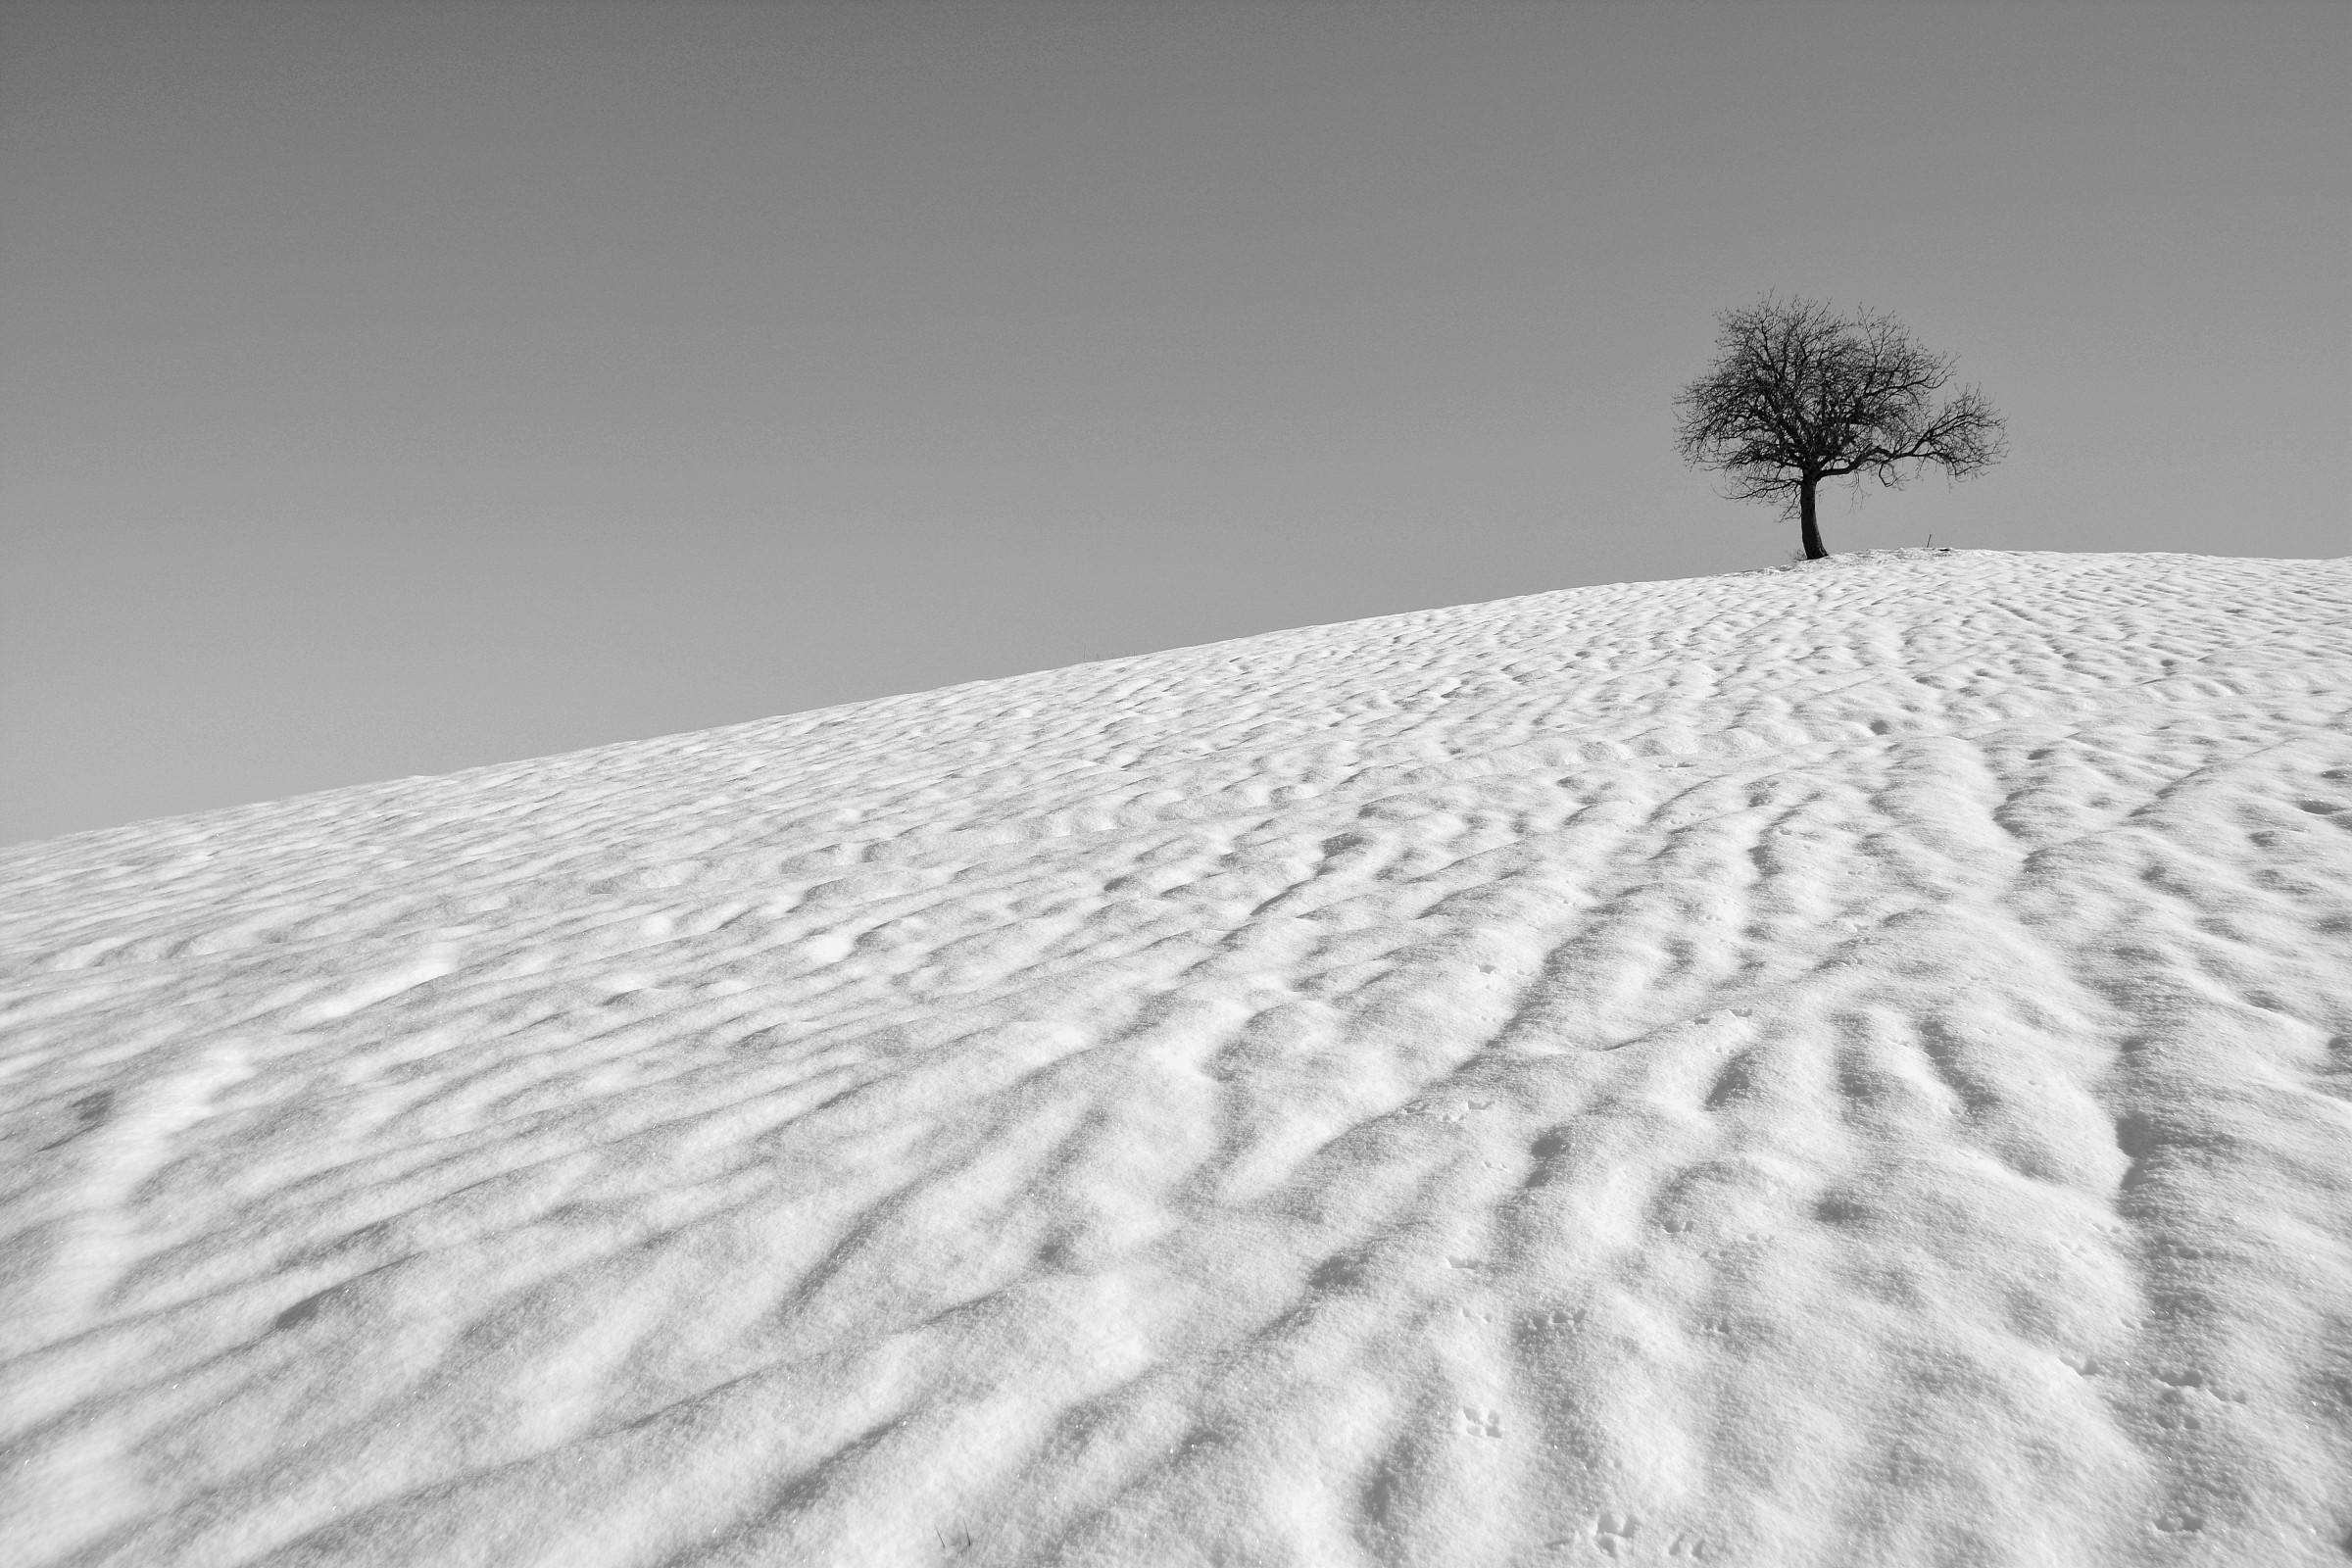 Serenity ......